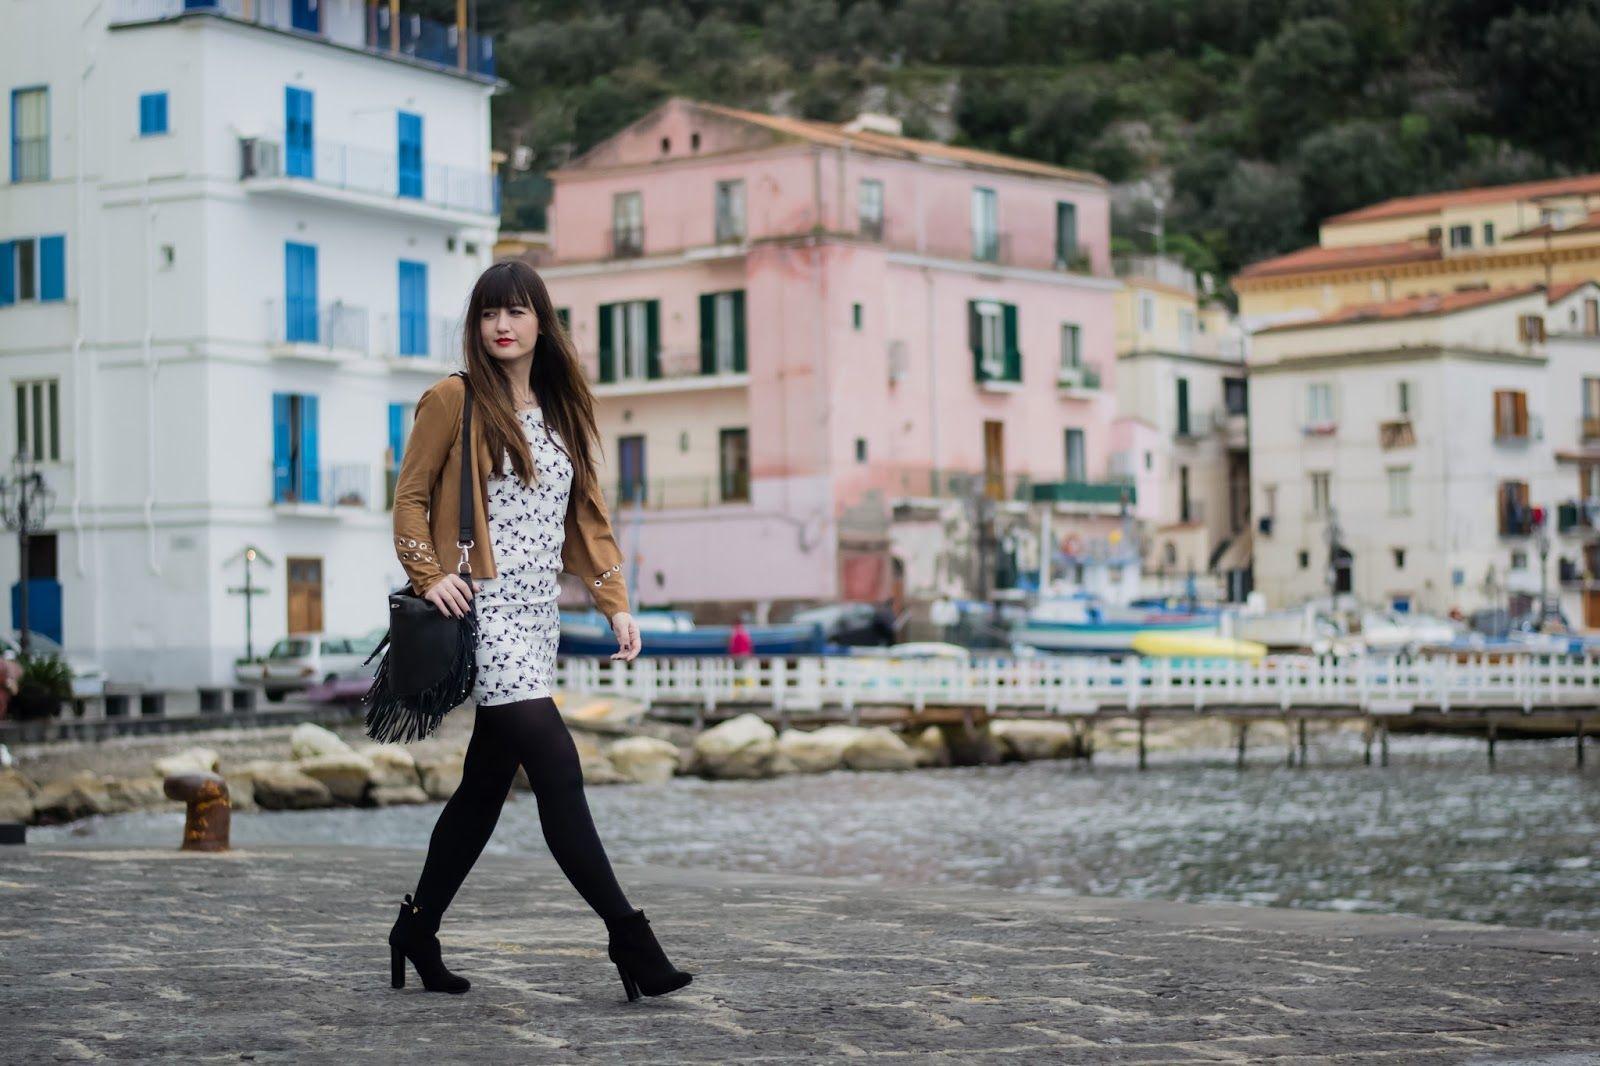 meet me in paree, blogger, fashion, look, style, chic, parisian, IKKS, Italy